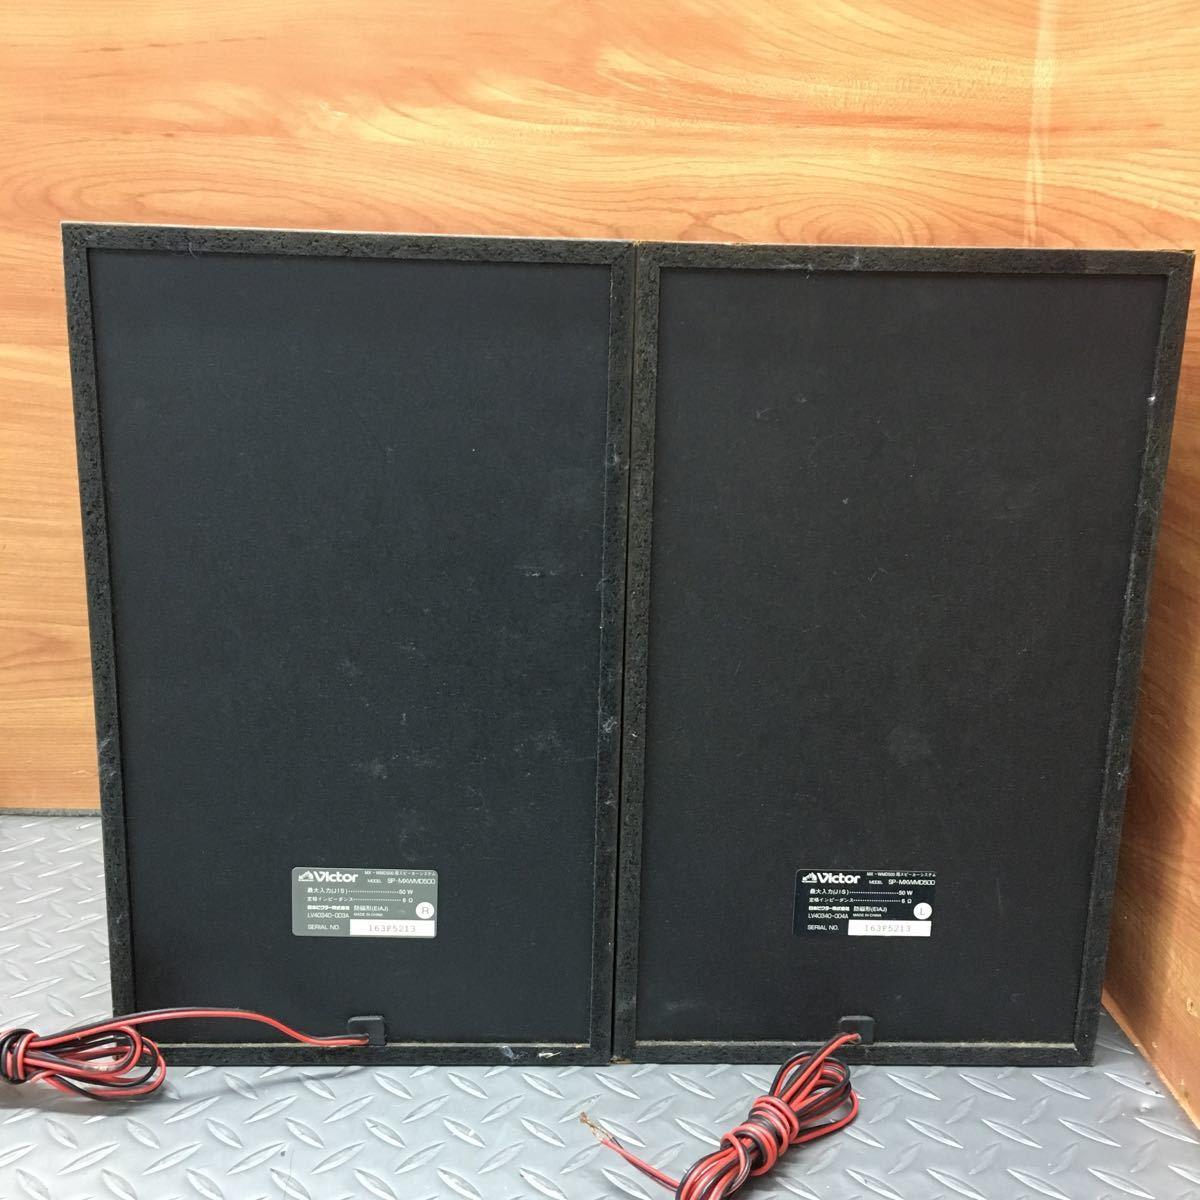 AD2746 Victor  динамик  SP-MXWMD500  Victor   проверено на работоспособность